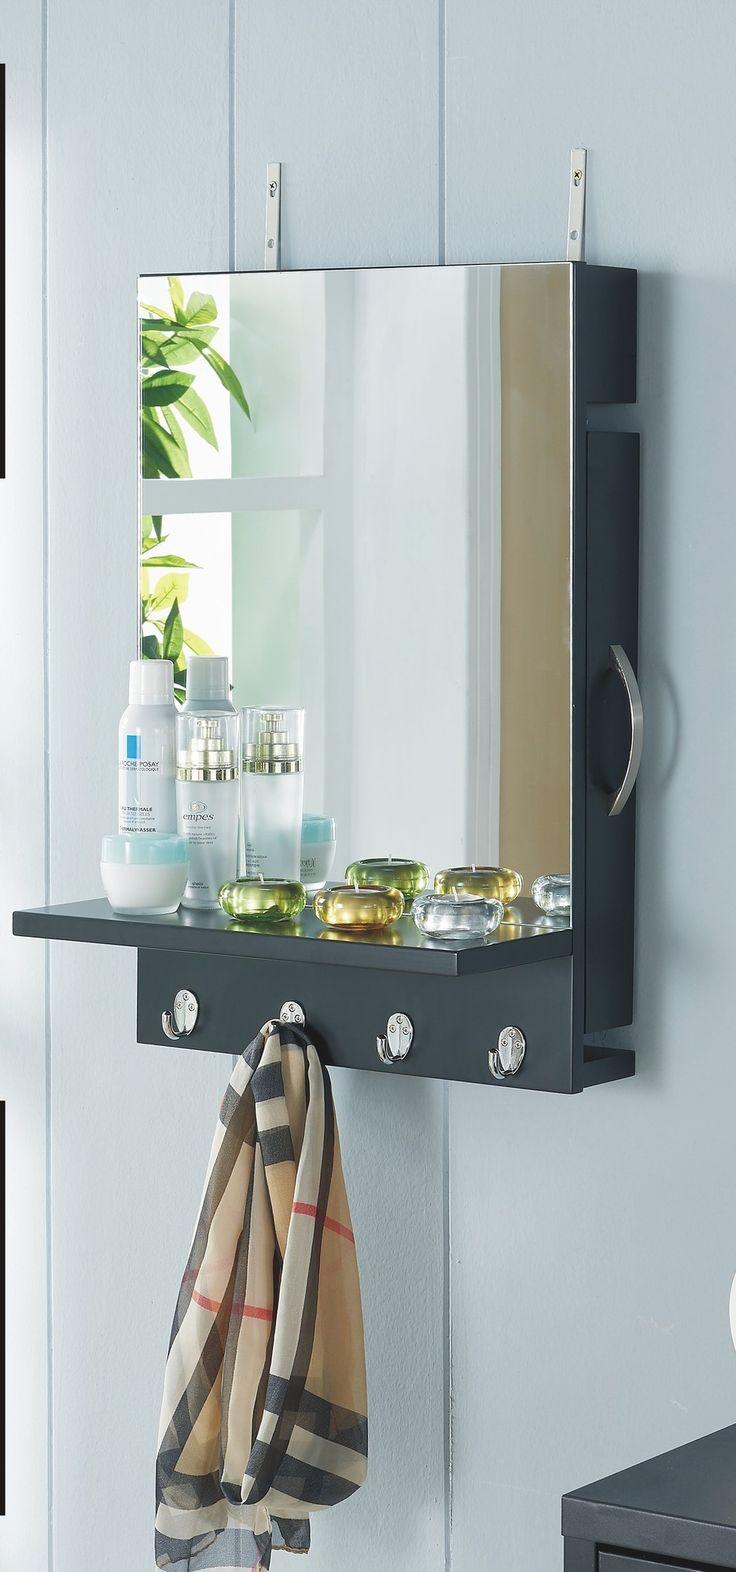 Wilko baroque mirror silver 87x62cm -  13 Best Bathroom Mirror Images On Pinterest Bathroom Mirrors